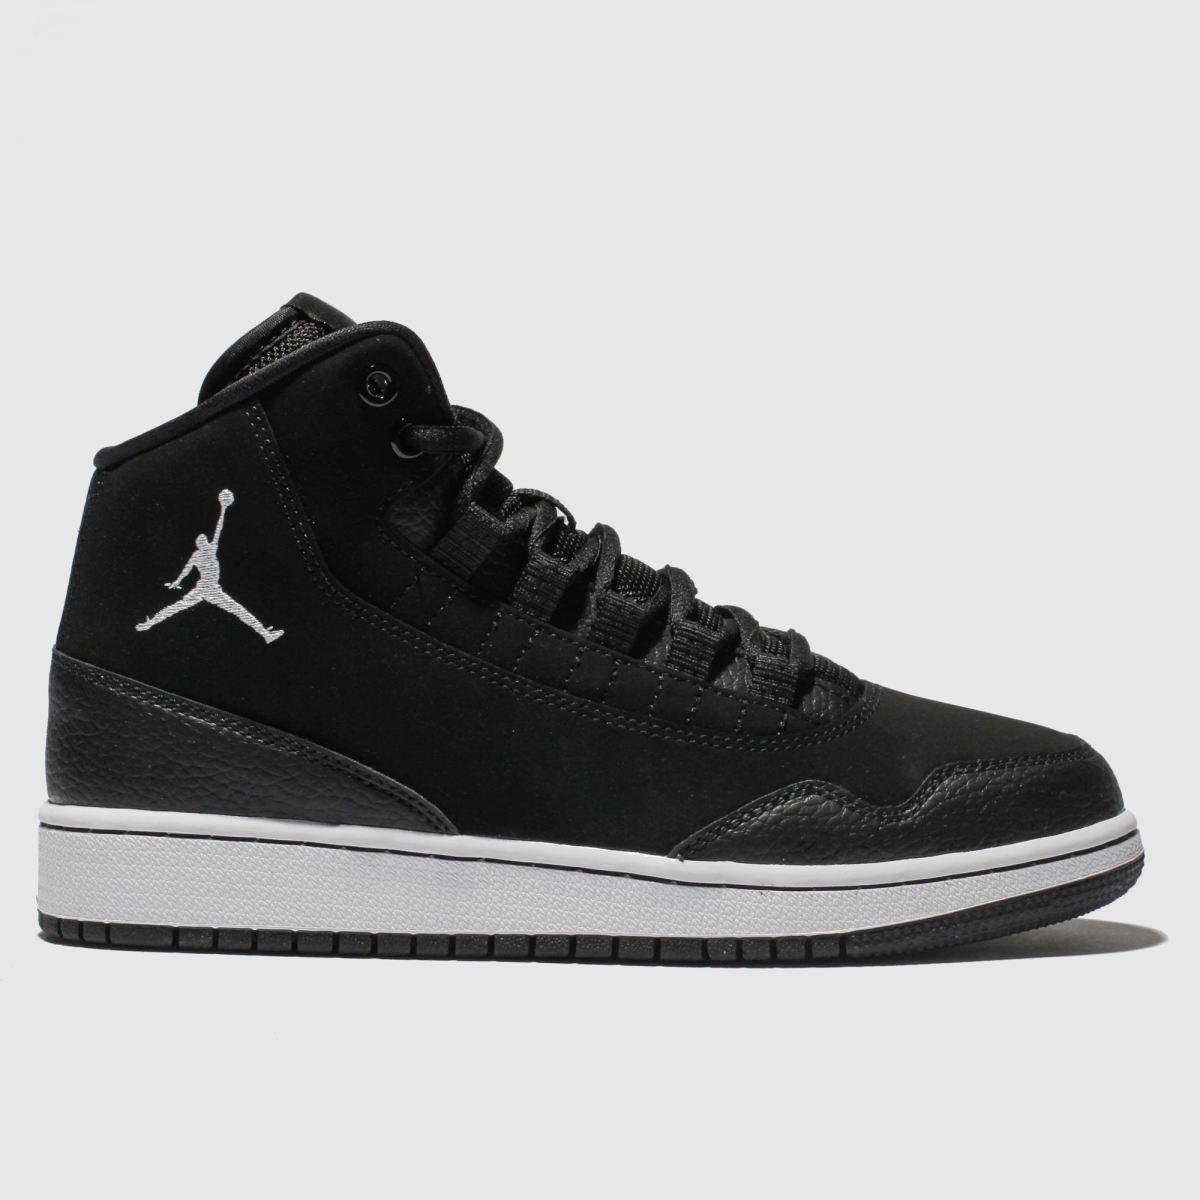 Nike Jordan Black & White Jordan Executive Trainers Youth